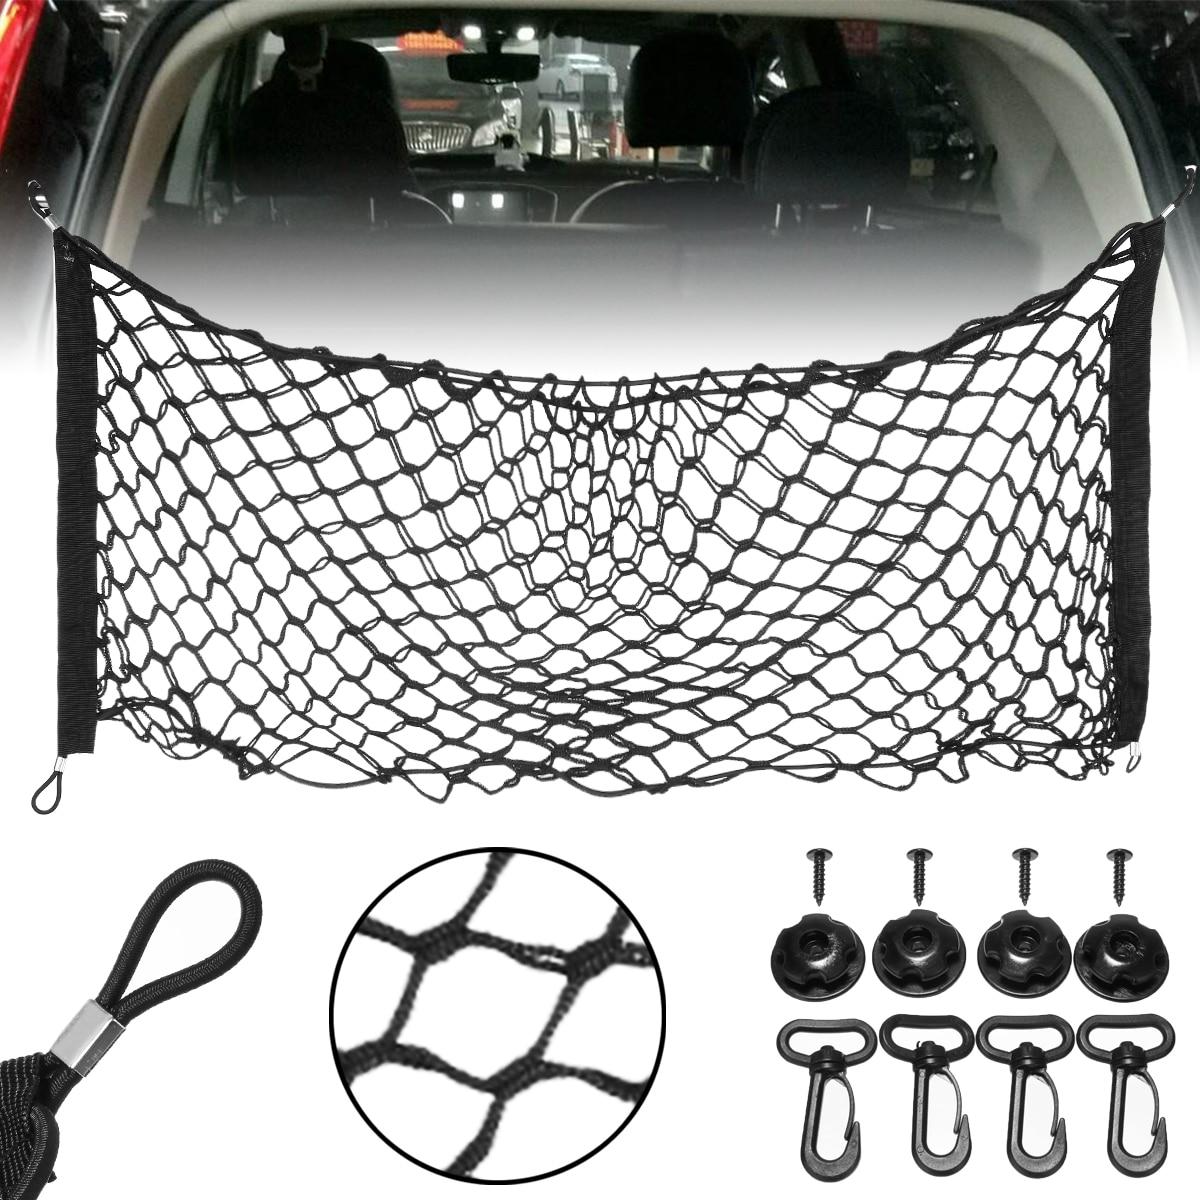 Car Trunk Nets 90x40 cm Elastic Strong Nylon Cargo Luggage Storage Organizer Net Mesh With Hooks For Car Pickup SUV